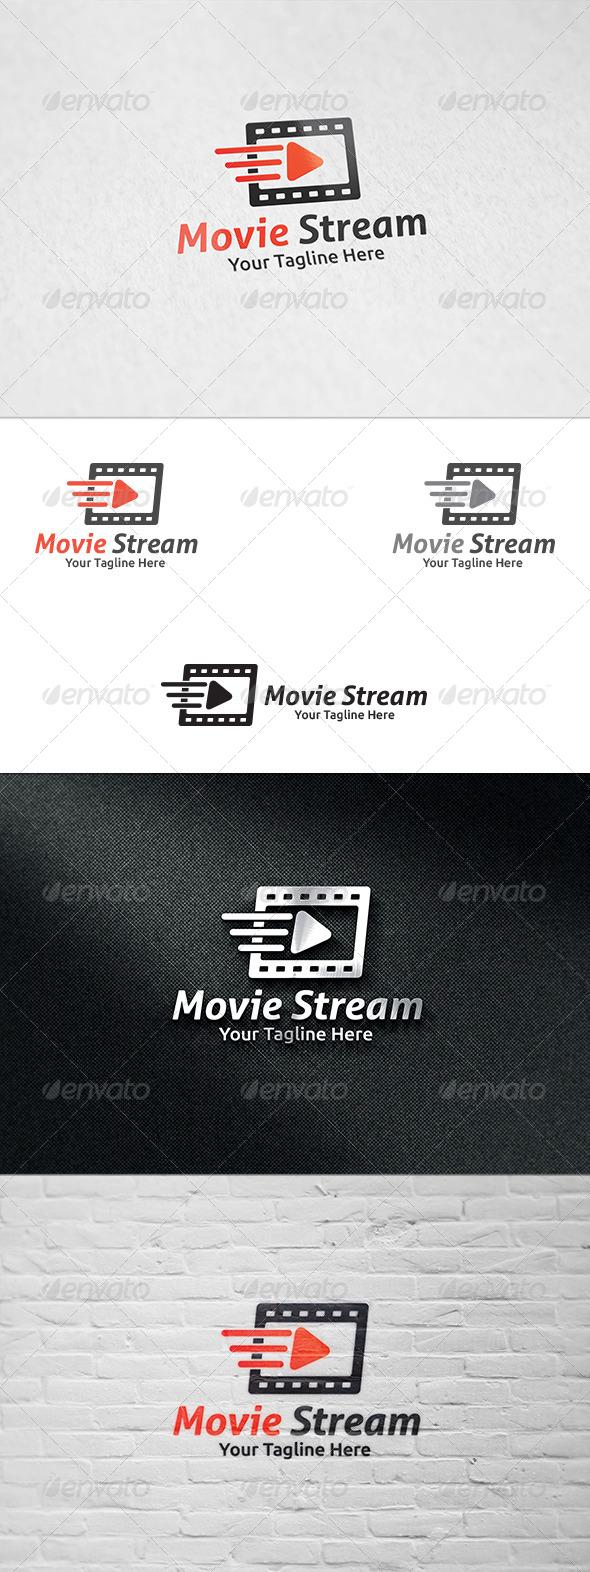 Movie Streaming - Logo Templae